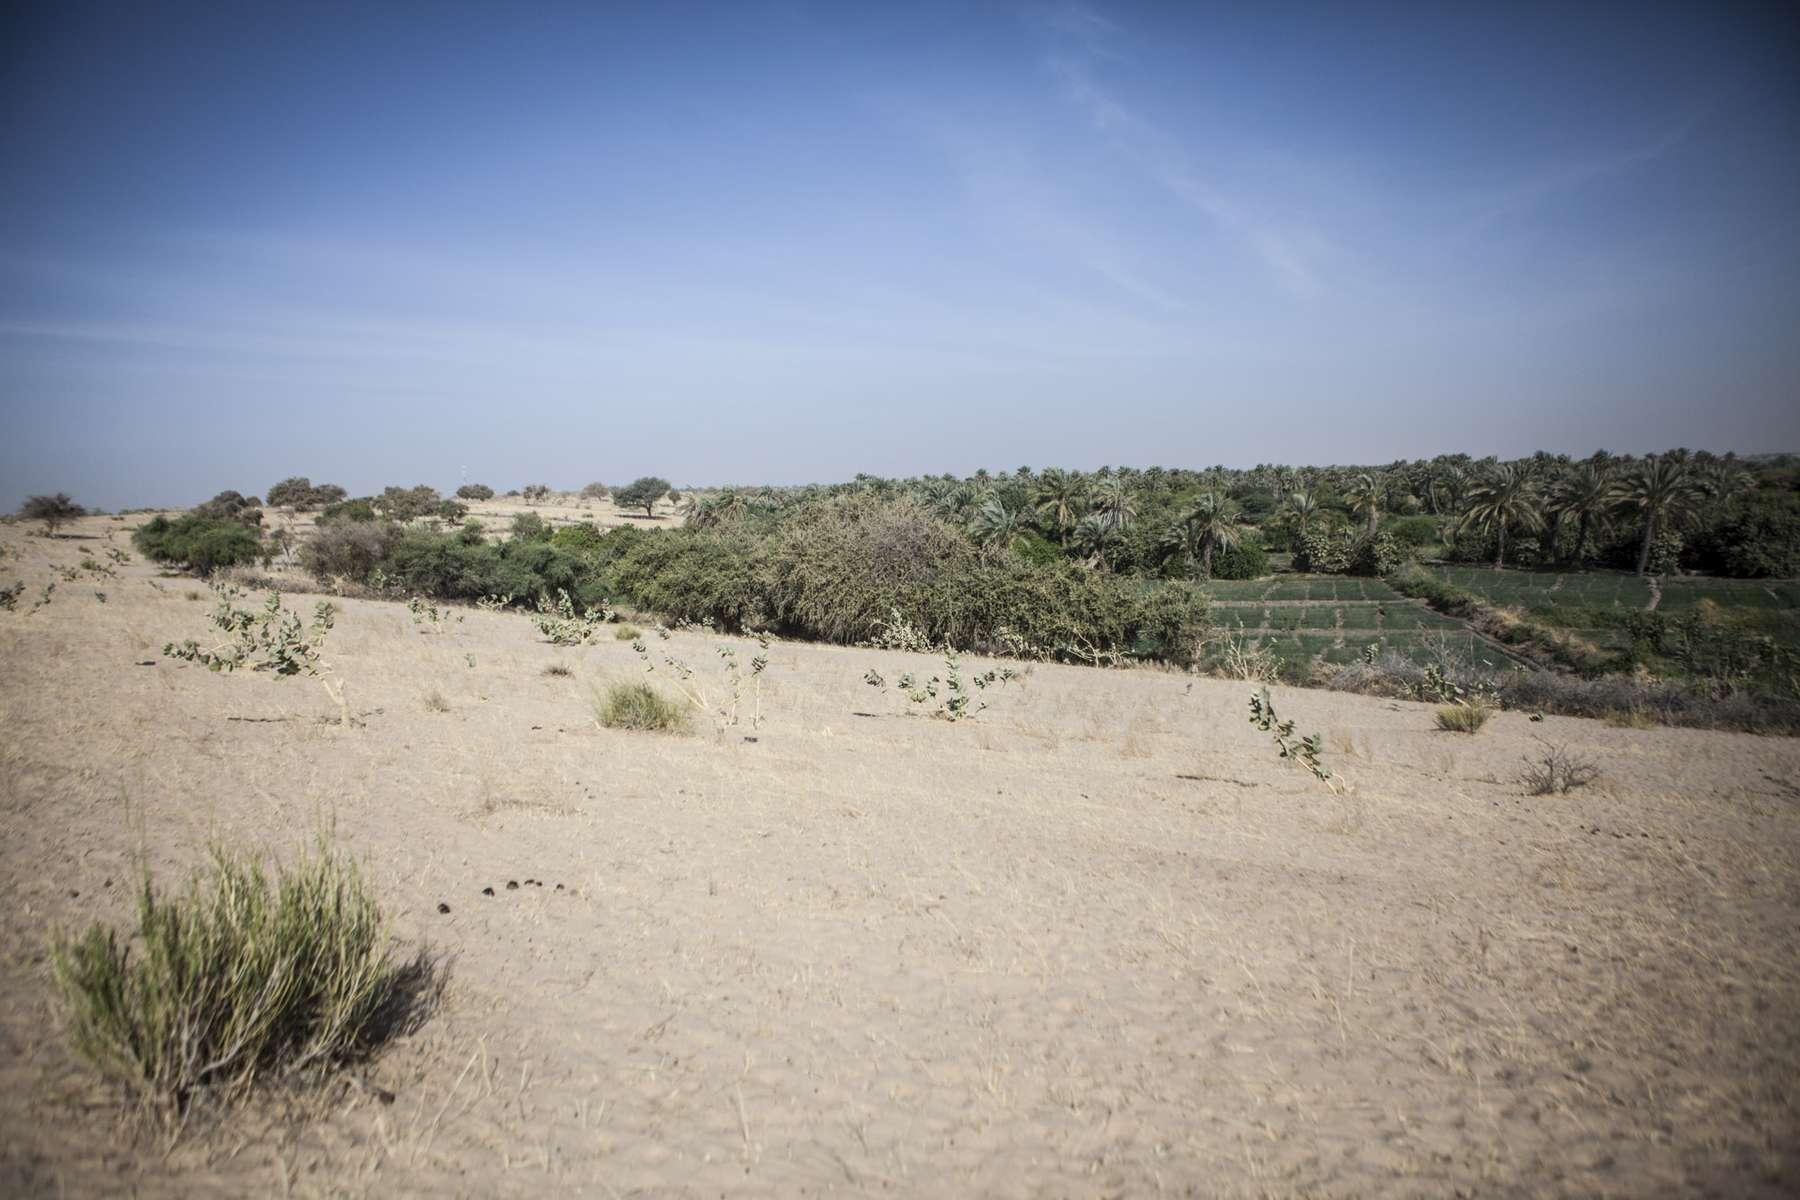 Farmland meets desert in Bagasola, Chad